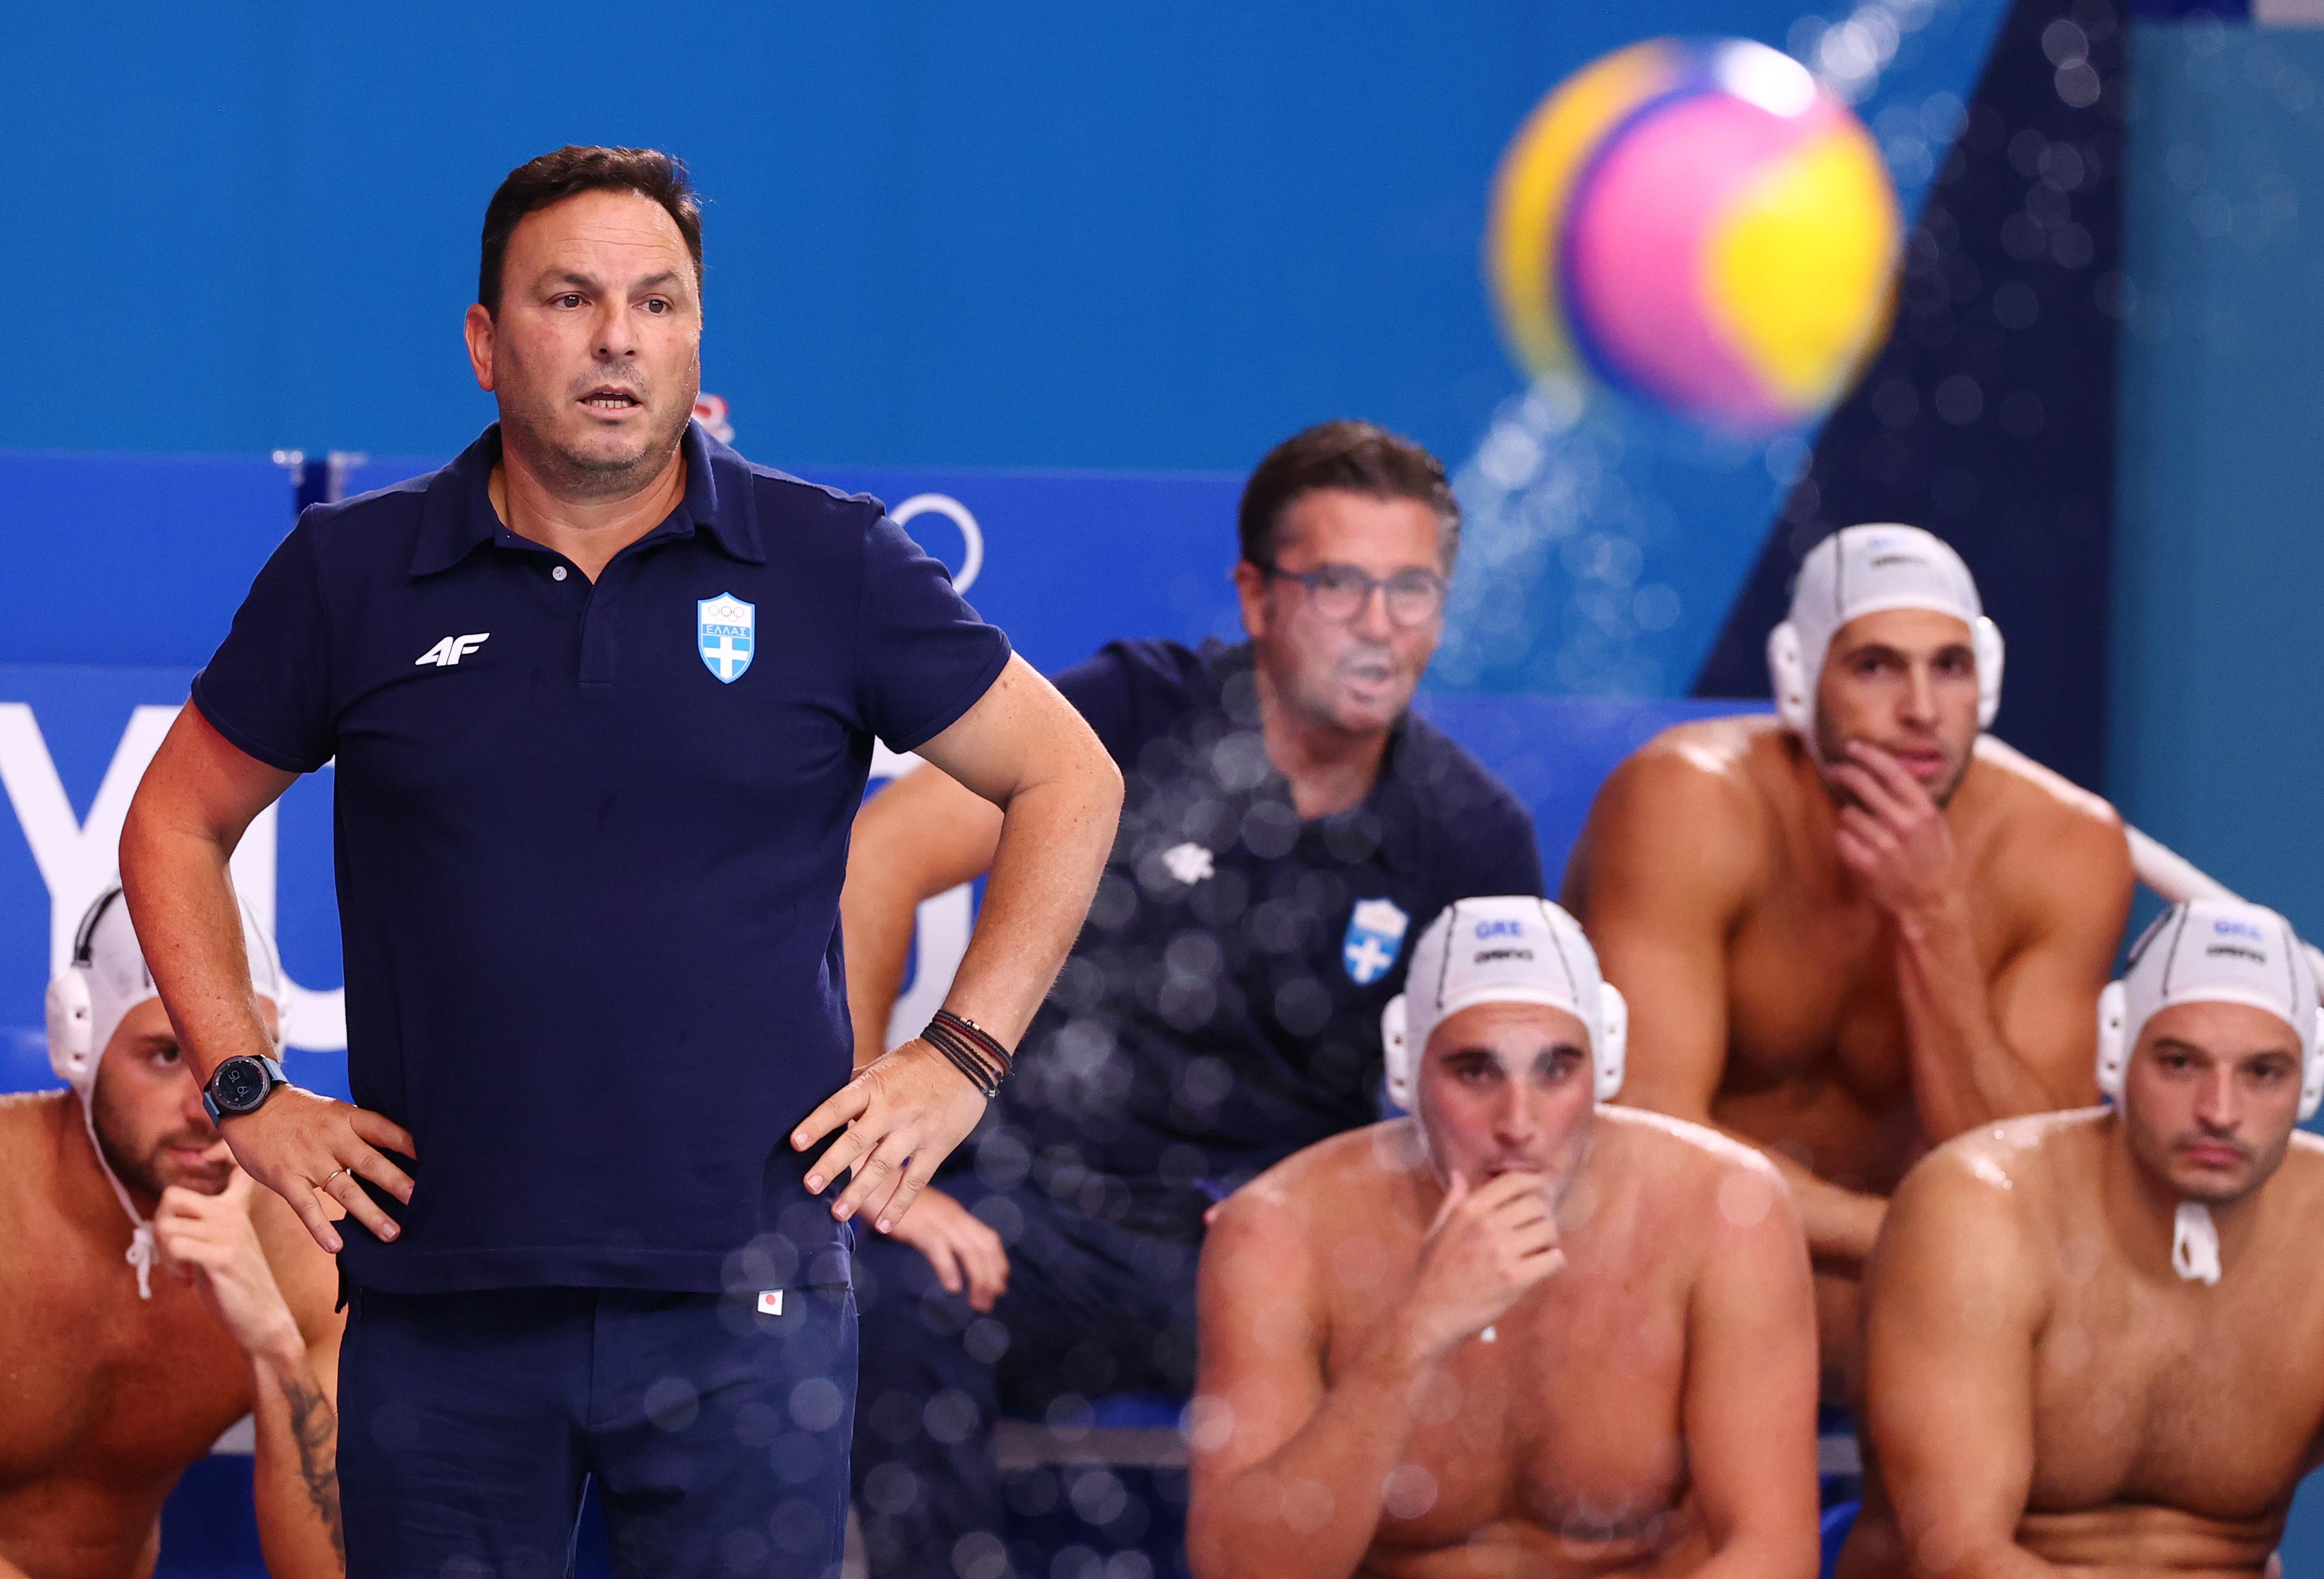 Tokyo 2020 Olympics - Water Polo - Men - Group A - Greece v Japan -  Tatsumi Water Polo Centre, Tokyo, Japan – July 29, 2021. Greece's head coach Theodoros Vlachos reacts. REUTERS/Kacper Pempel